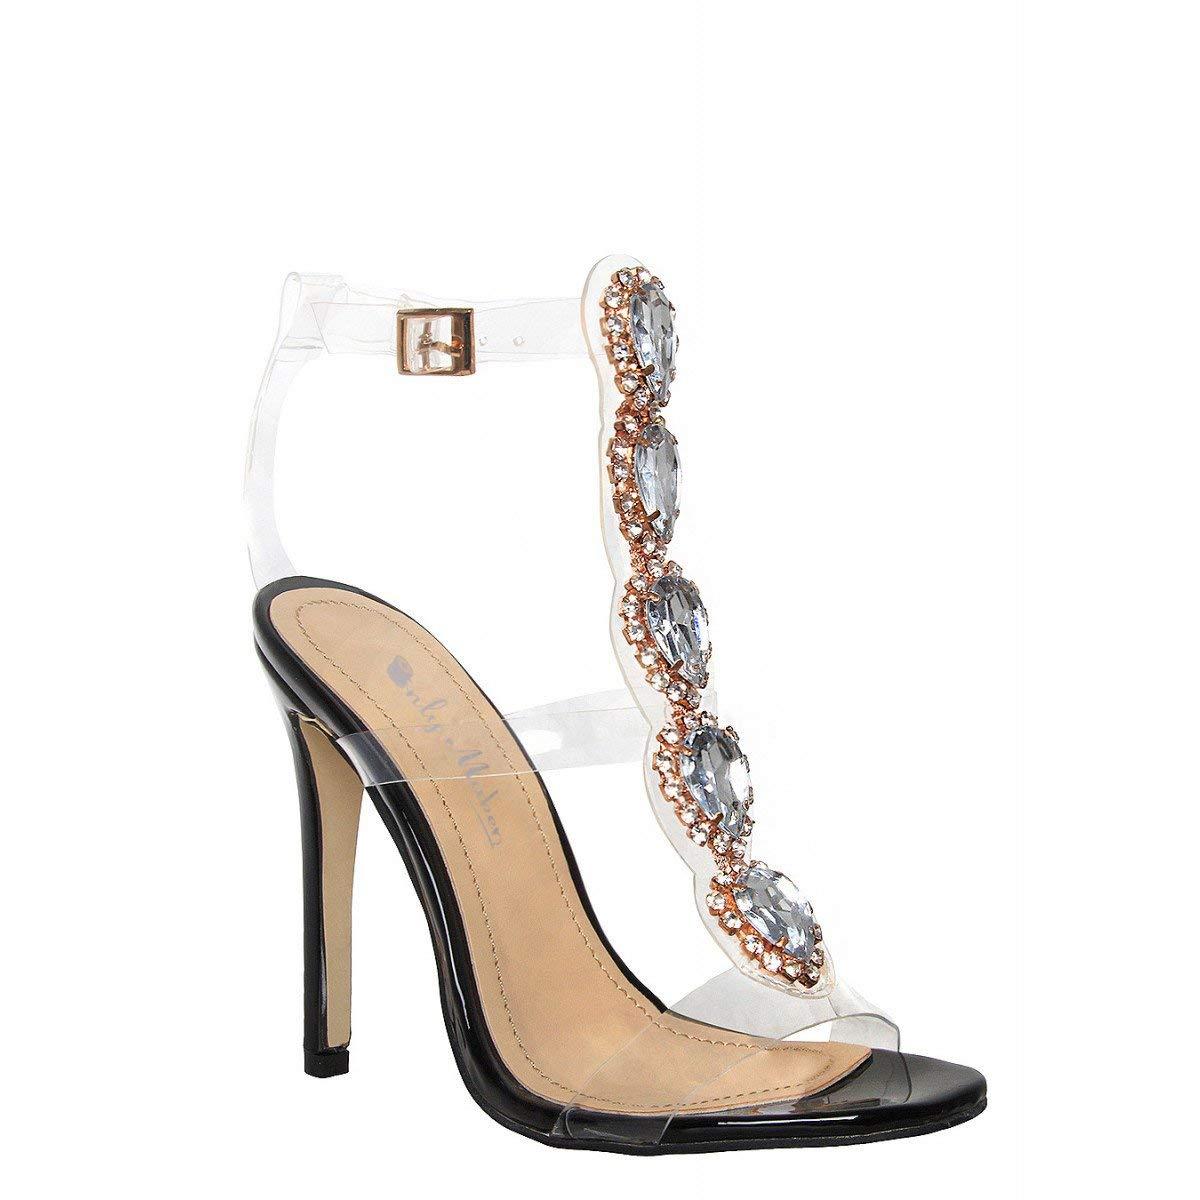 757bc99b400 onlymaker Womens Ankle Strap Block Sandals Gem Clear Stiletto High Heels  Gladiator Transparent Sandals with Rhinestones